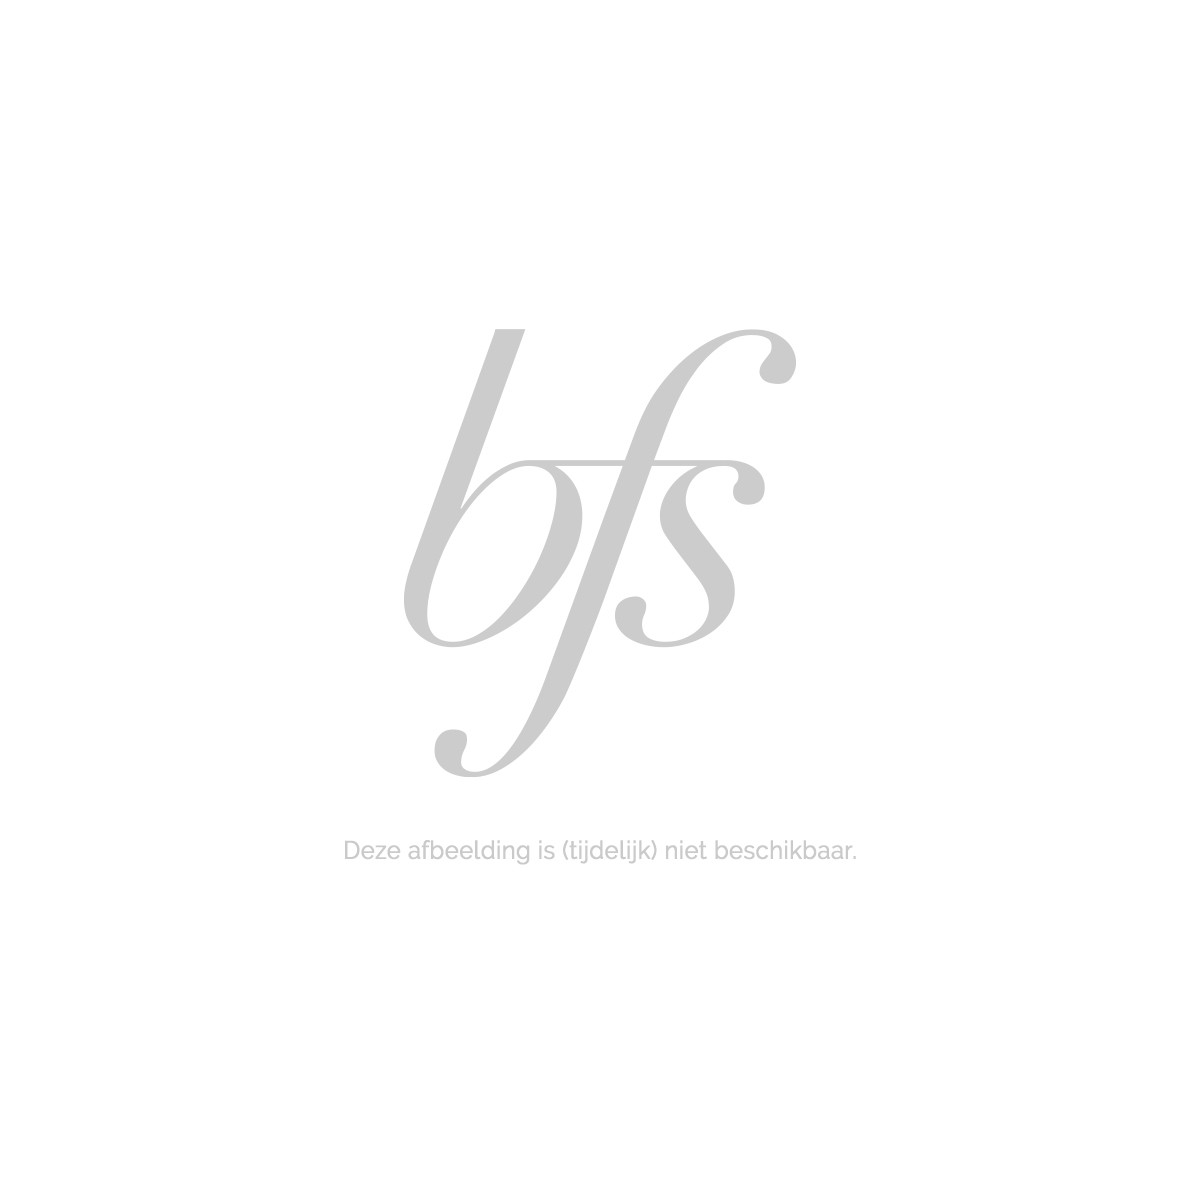 Ibp Stiletto Edge Tips Natural 100 Pcs